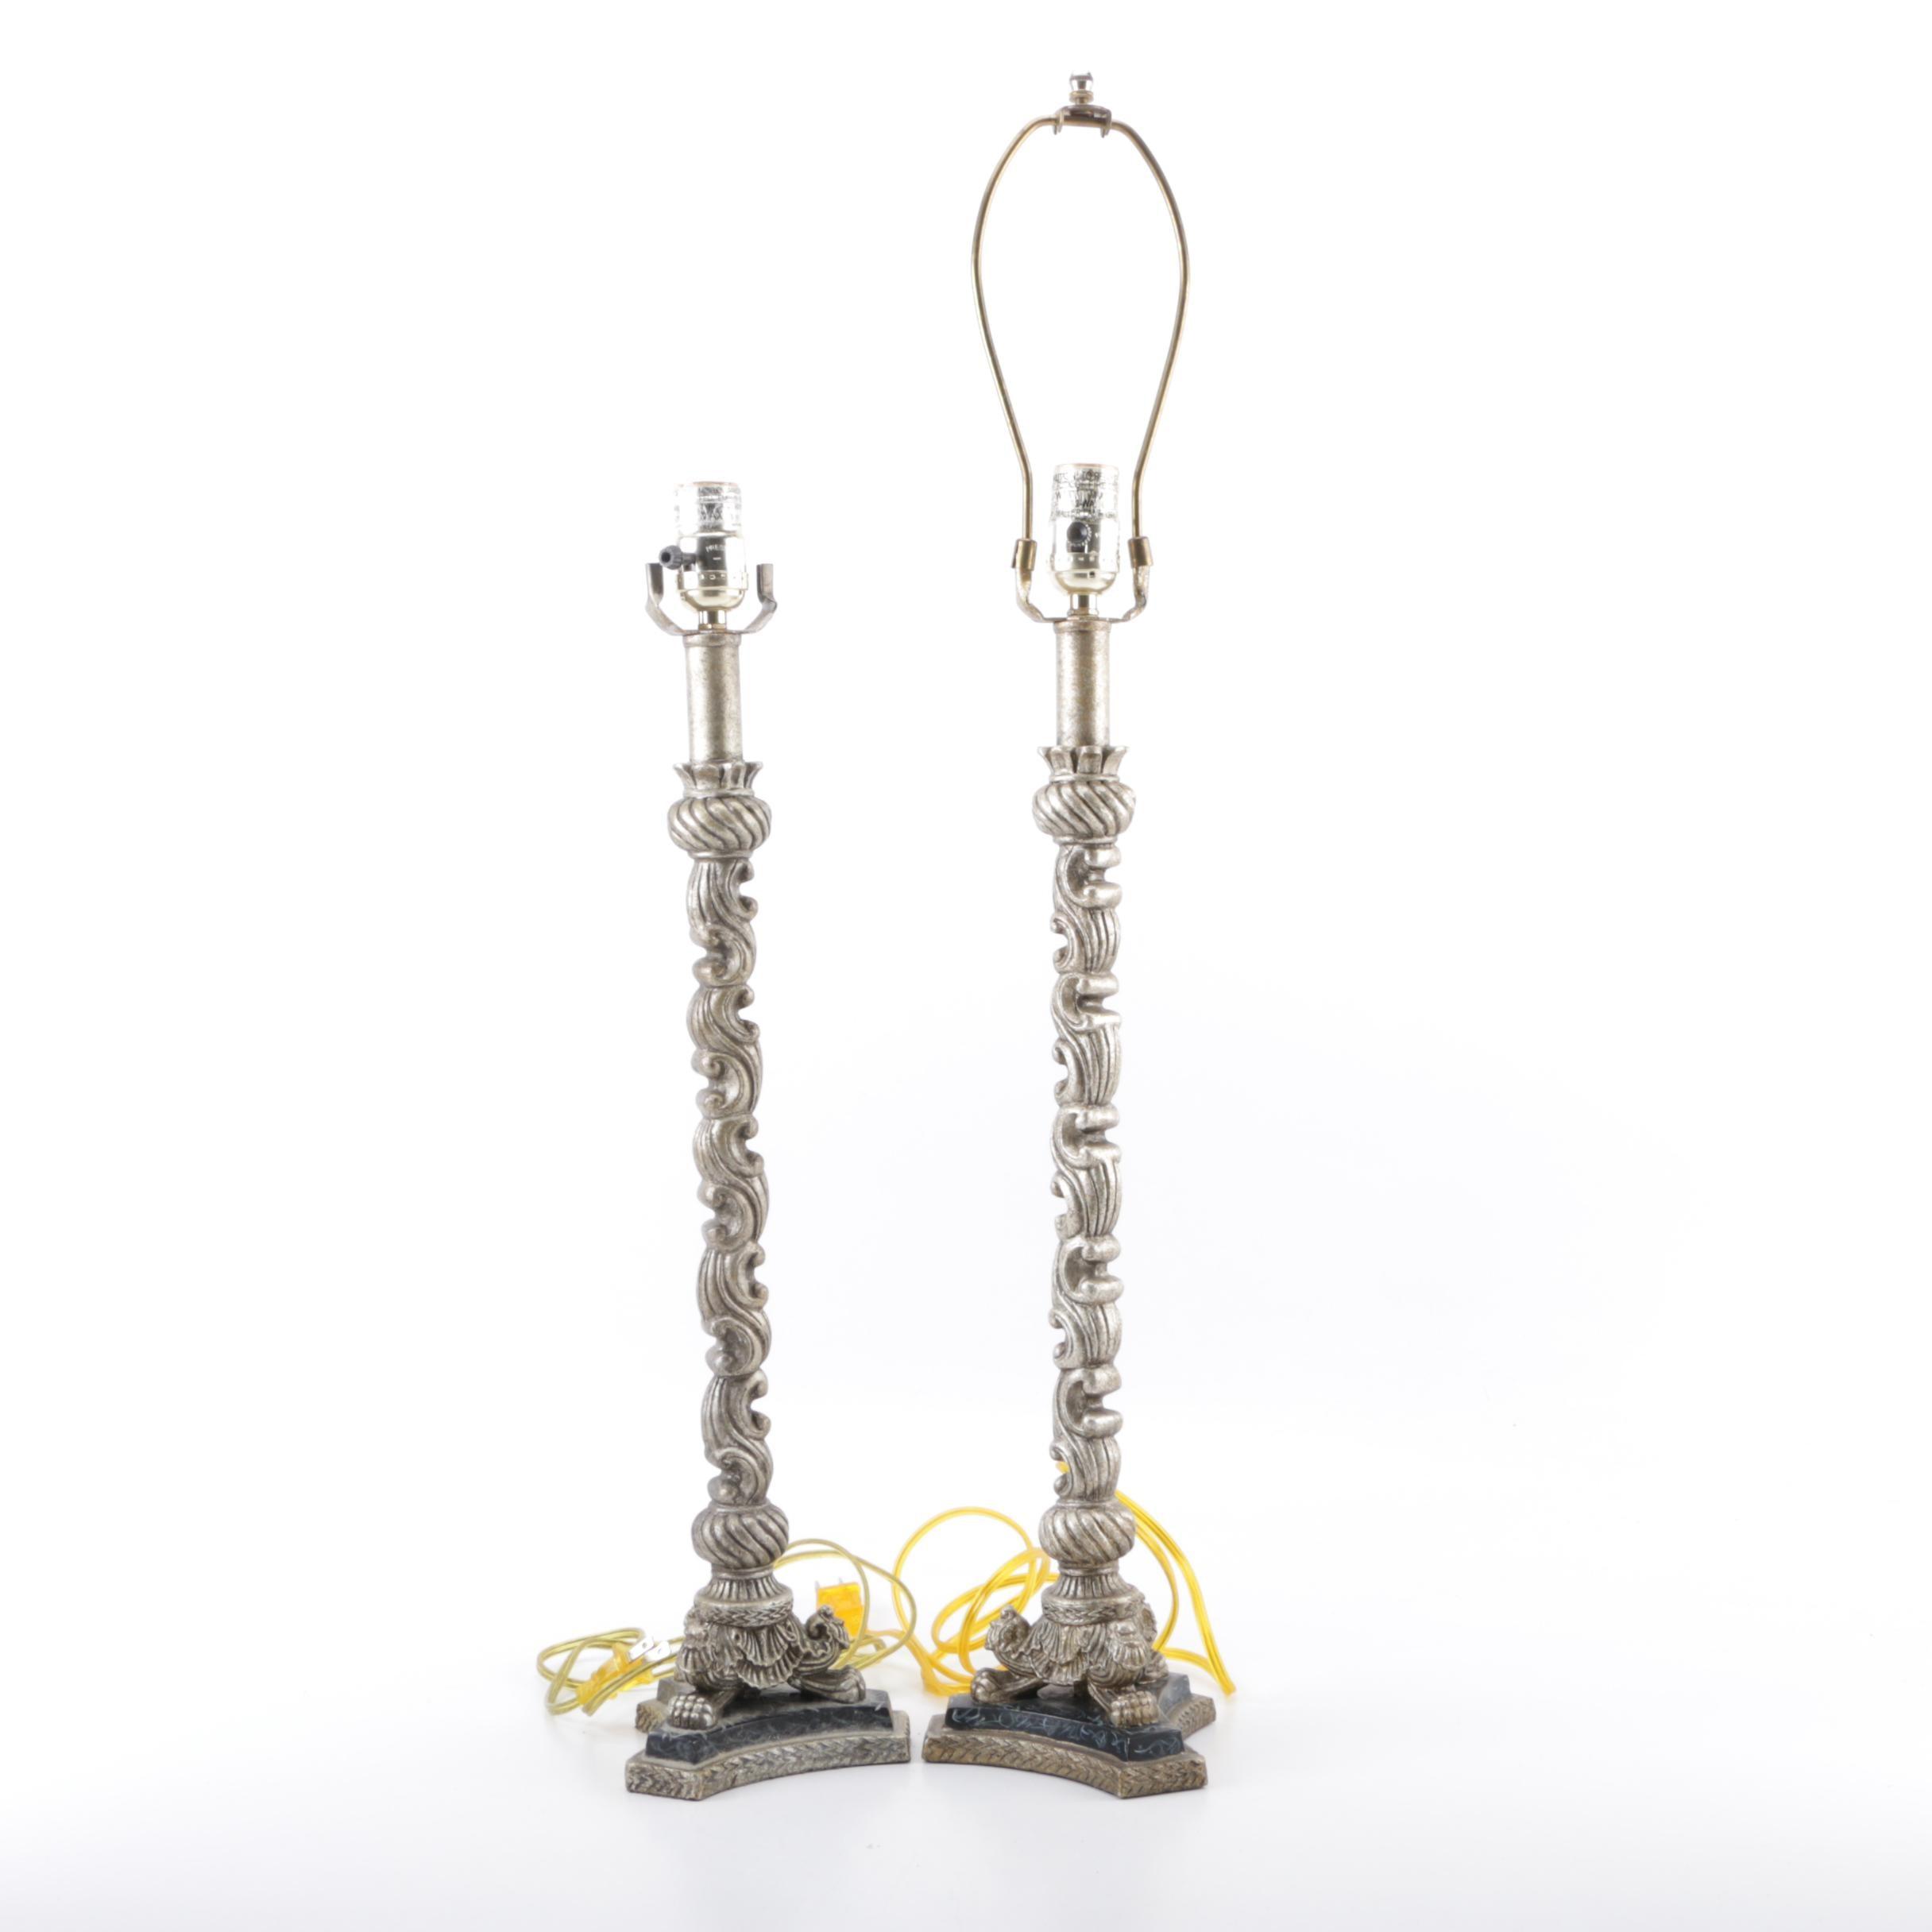 Metal Candlestick Lamps